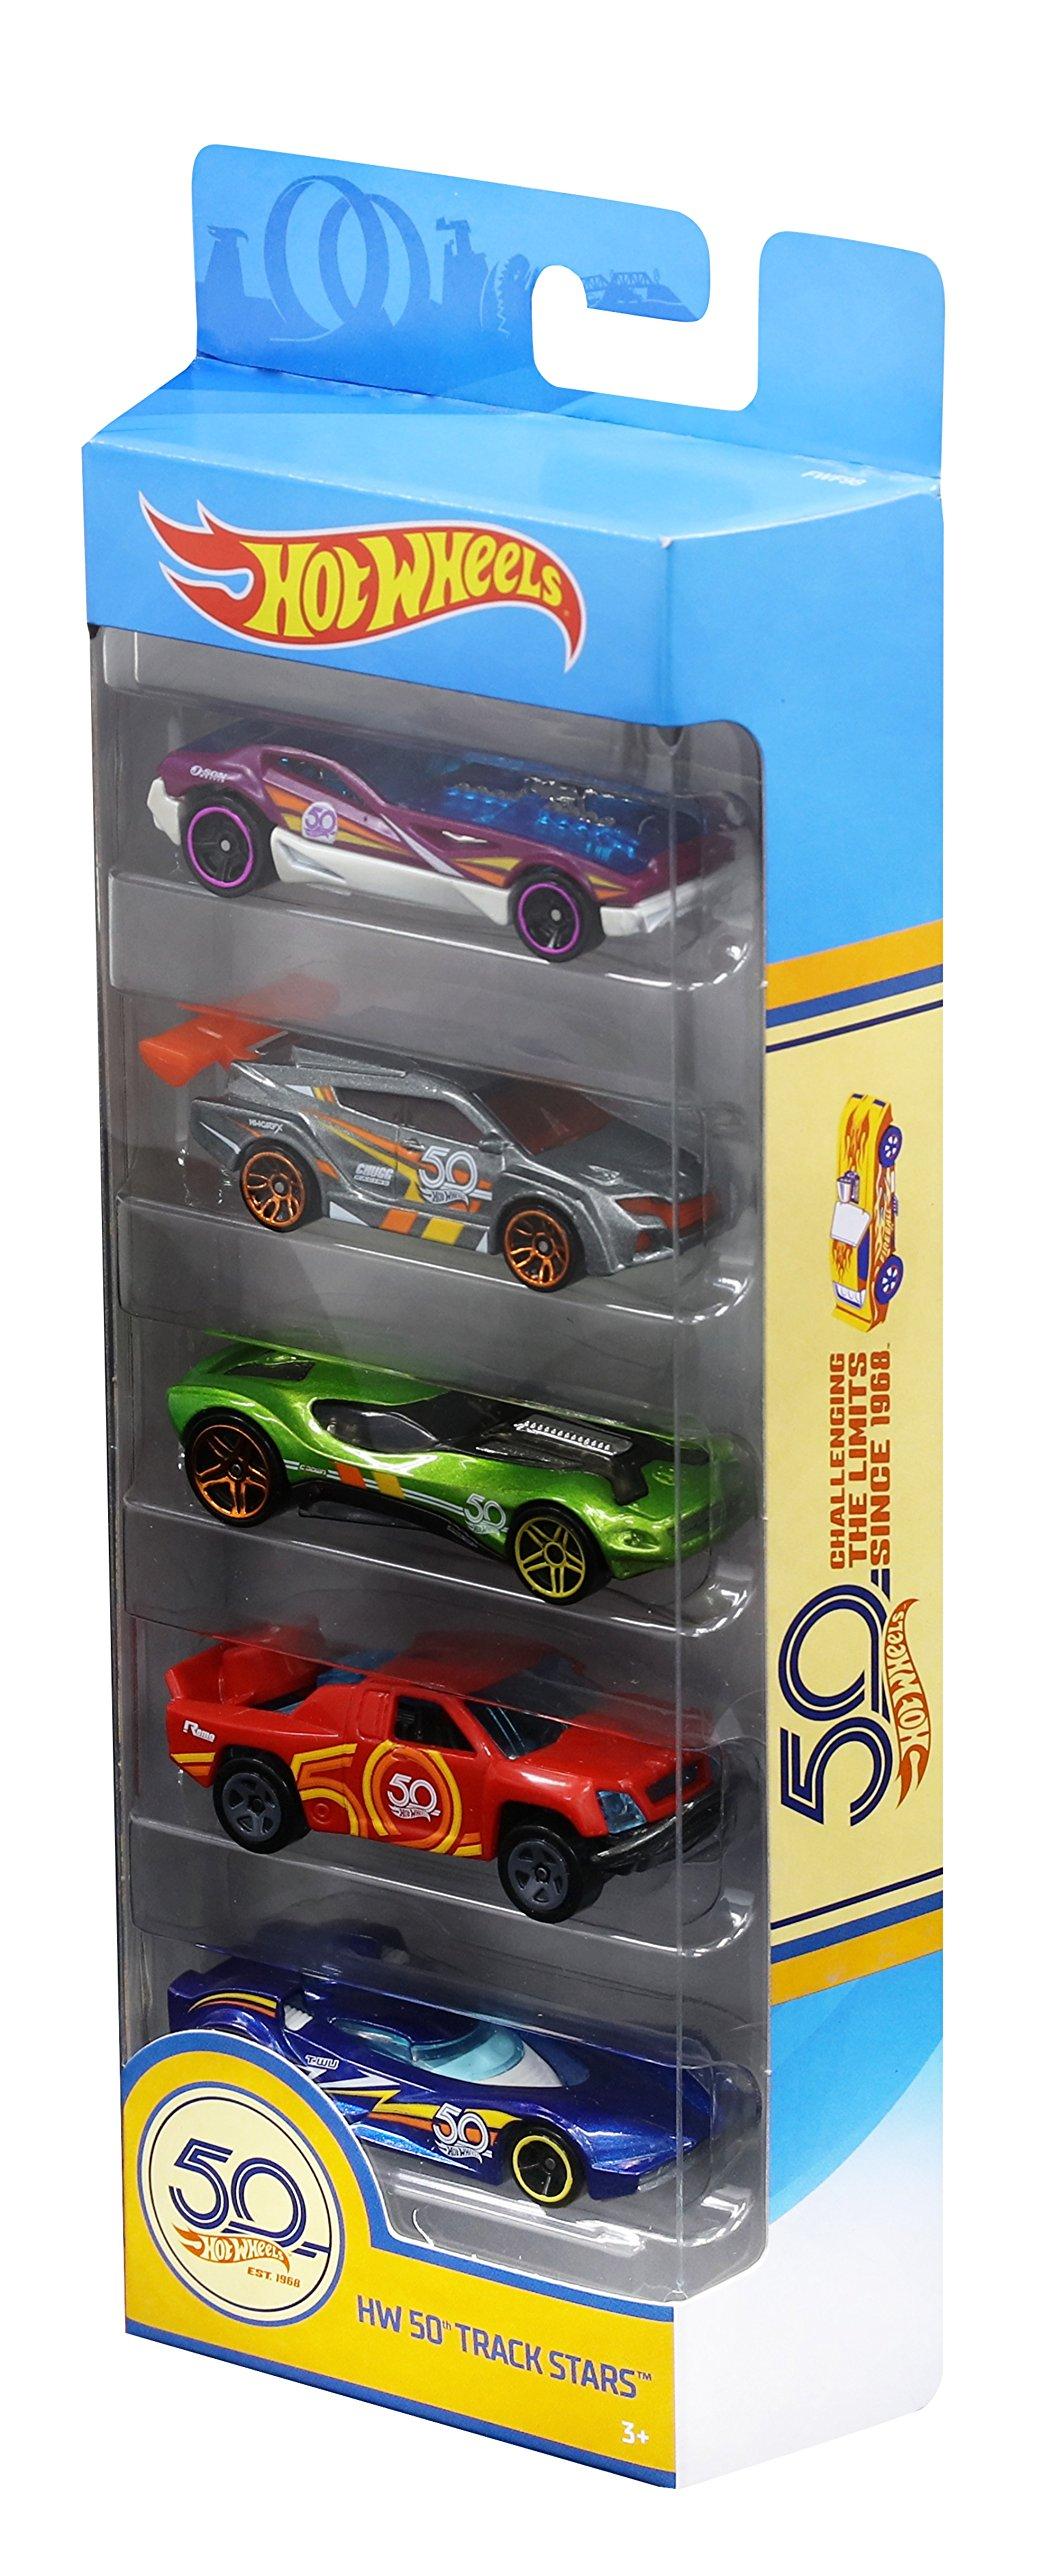 Hot Wheels FWF98 50th Anniversary Car 5 Pack Slot Cars, Race